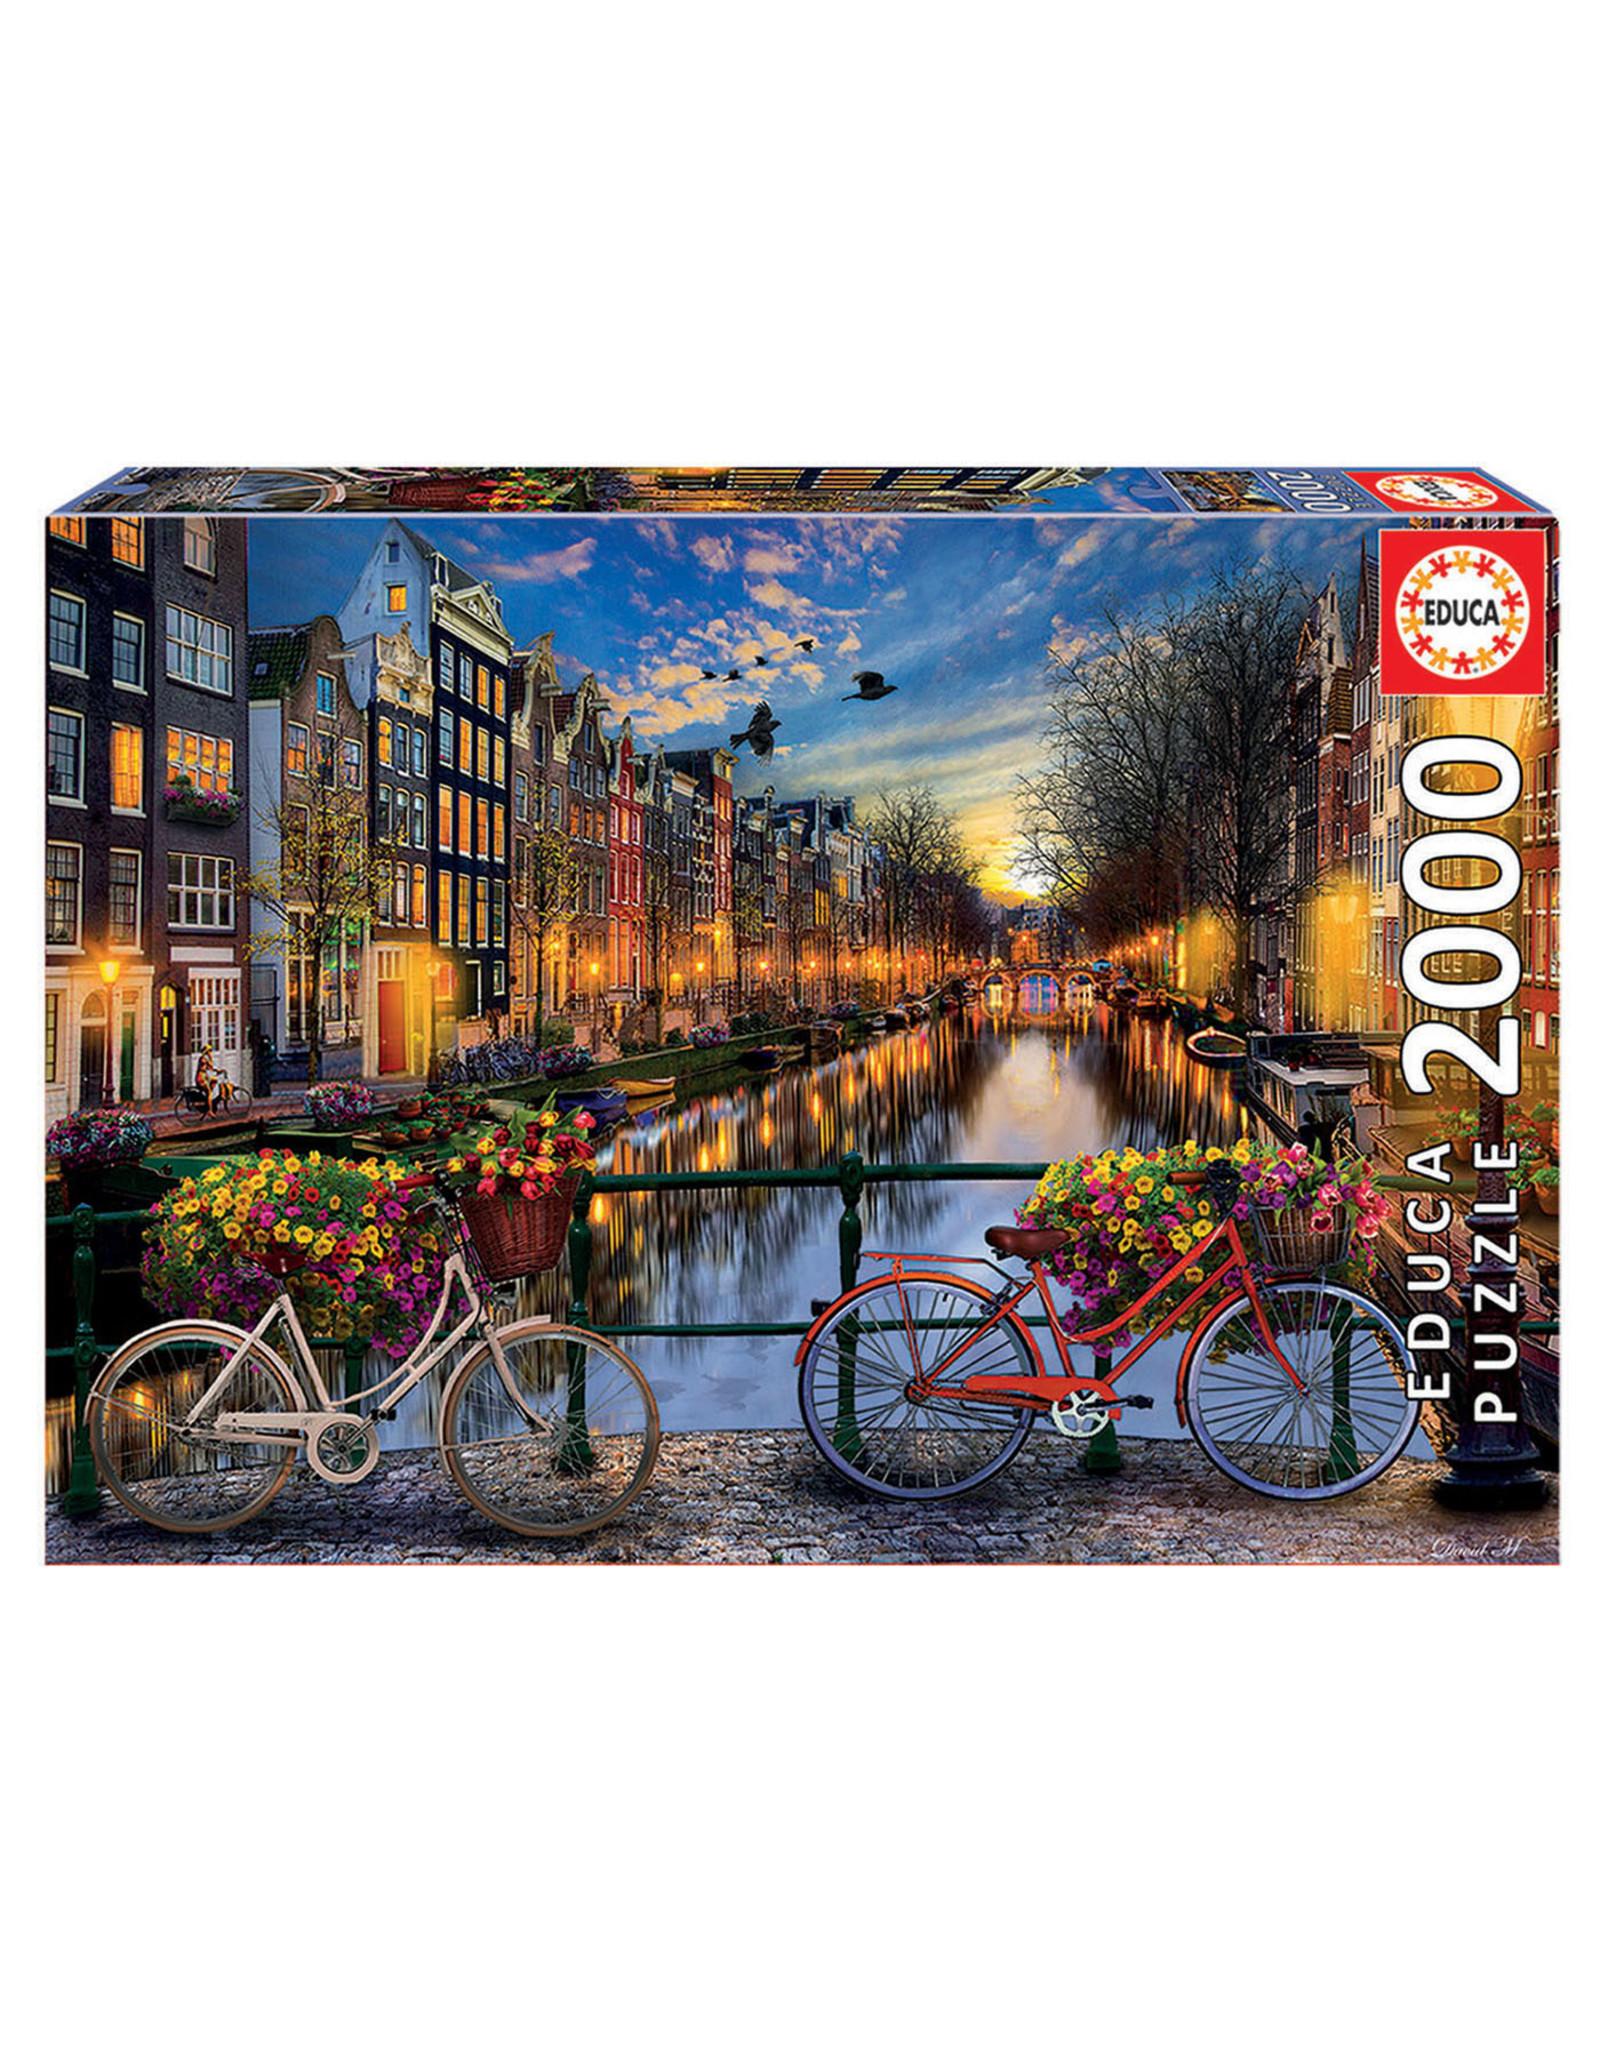 Educa Puzzles Amsterdam with Love 2000pc